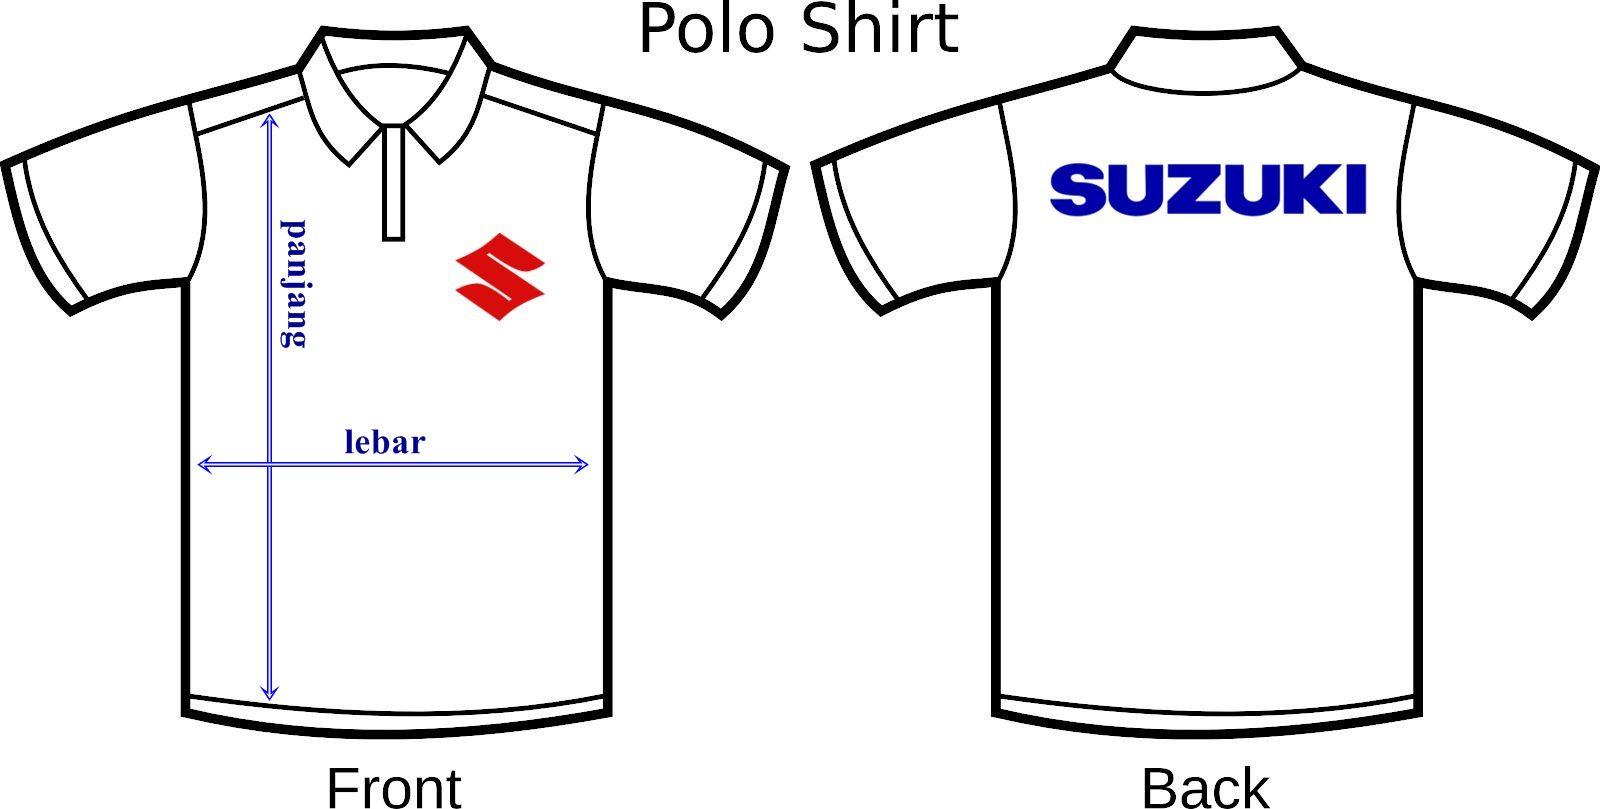 San Anda Adalah Prioritas Kami Selamat Datang Di Kaos Kerah Polos Polo  Grosir Bordir Contoh Depan Logo Belakang Tulisan